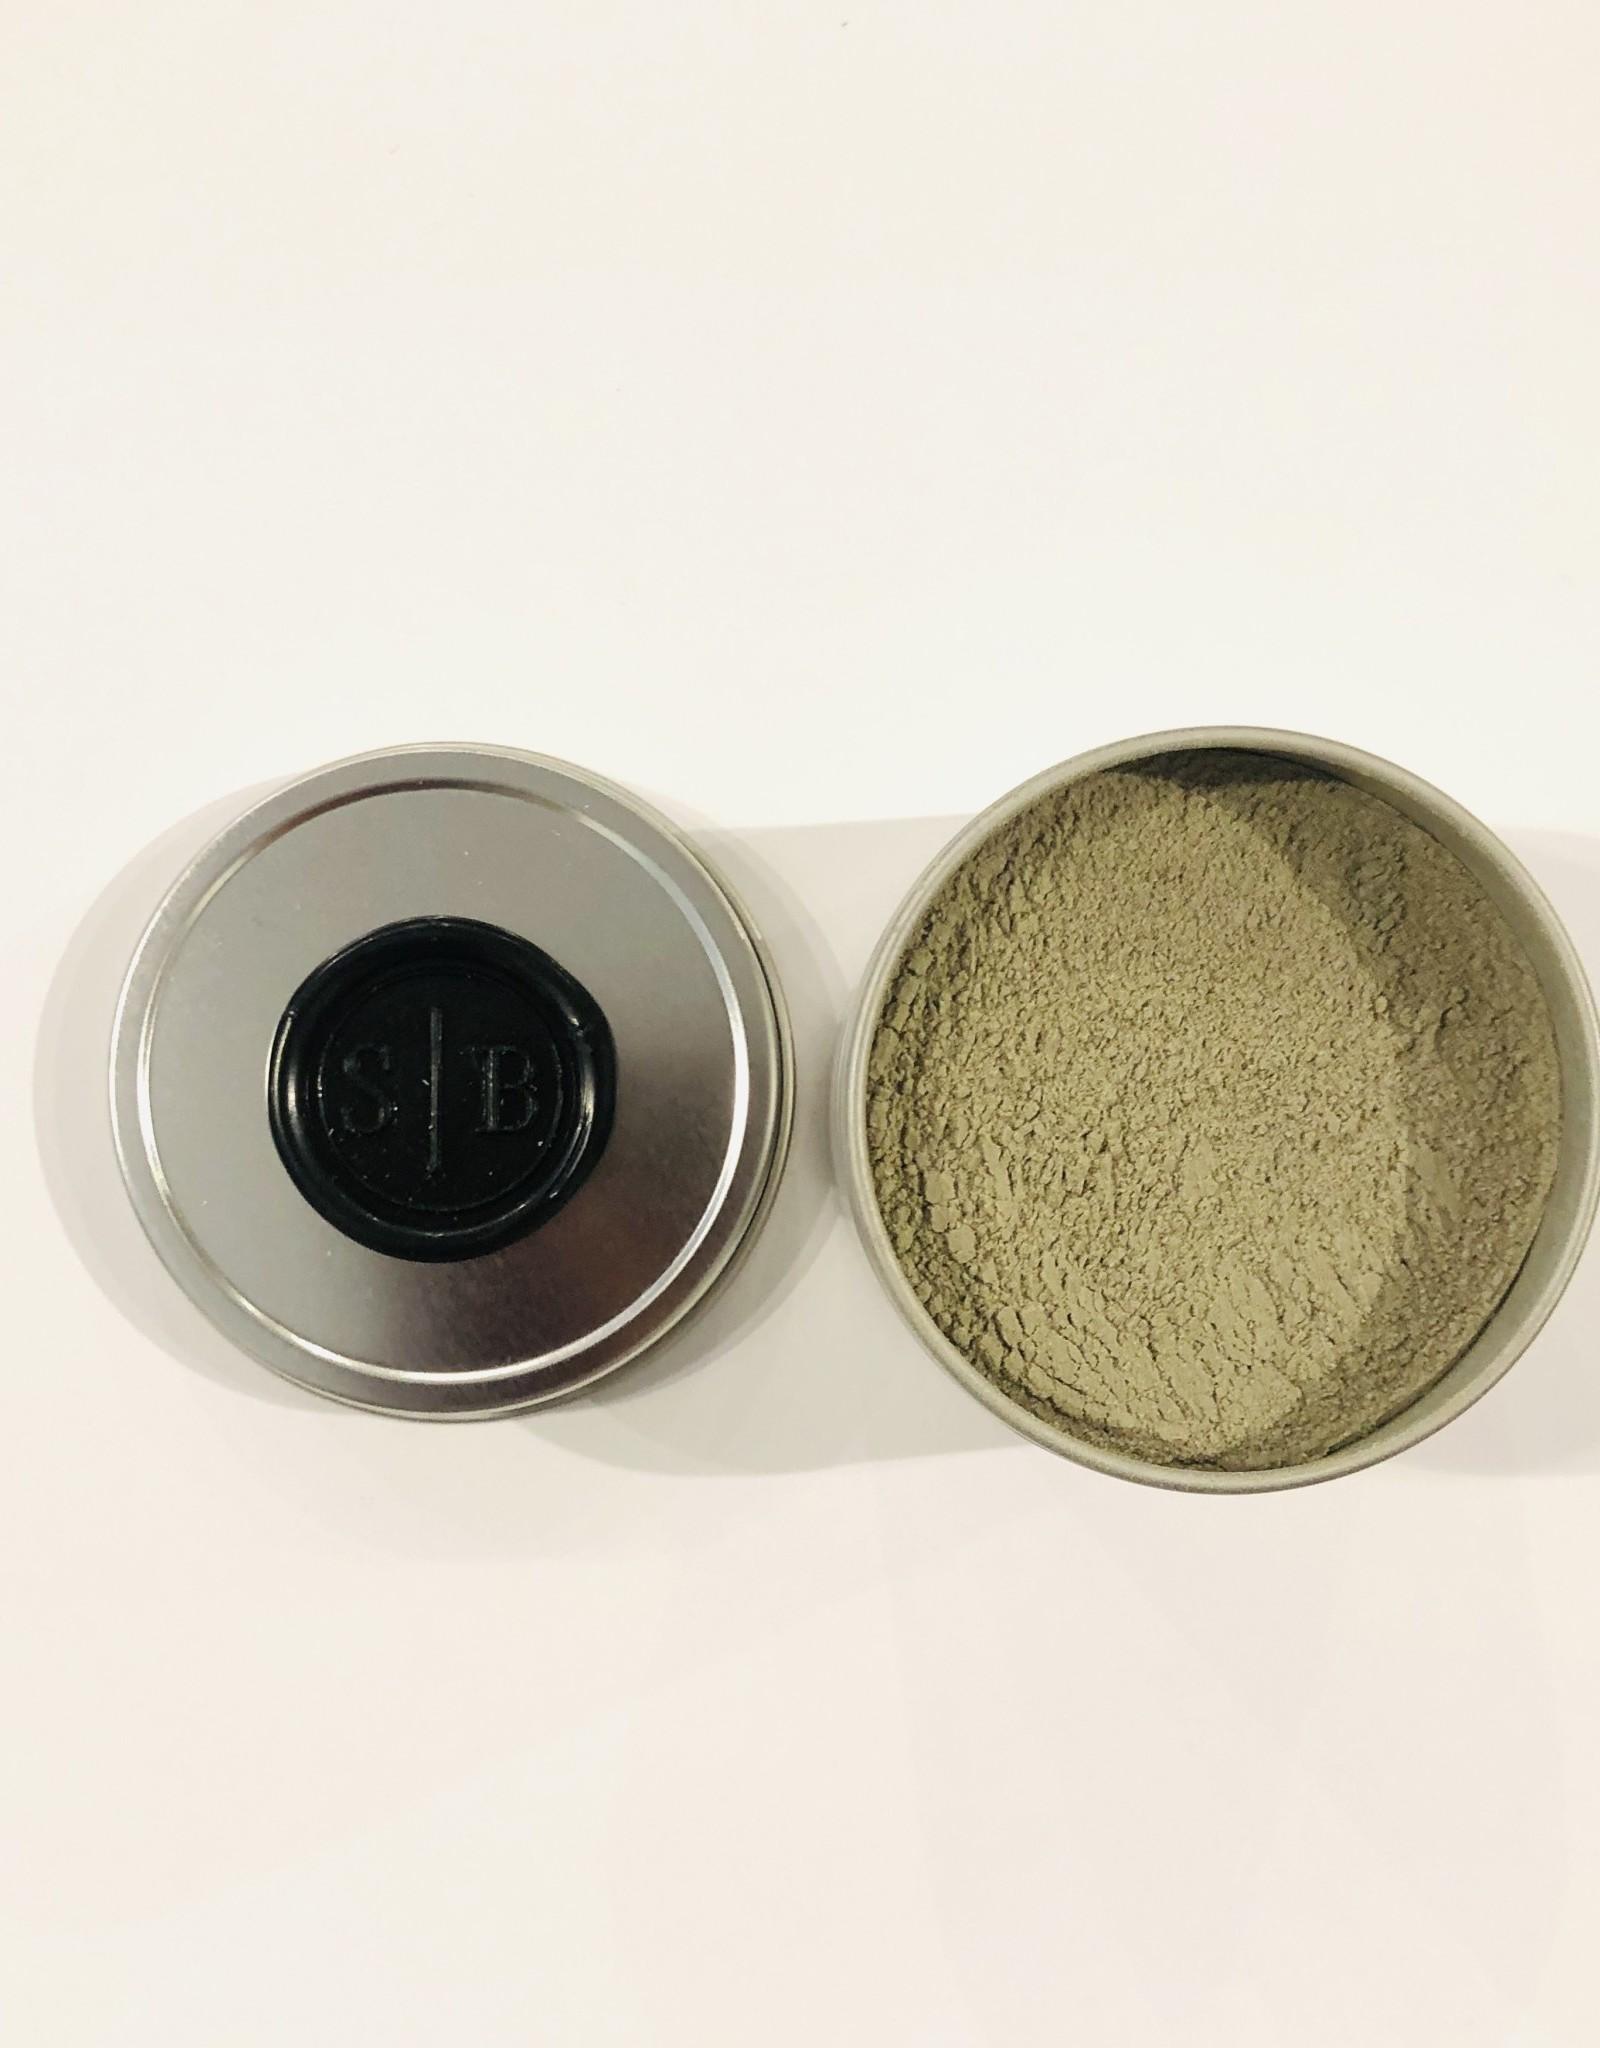 Scandic Botanica 4 oz. sea + nettle face mask